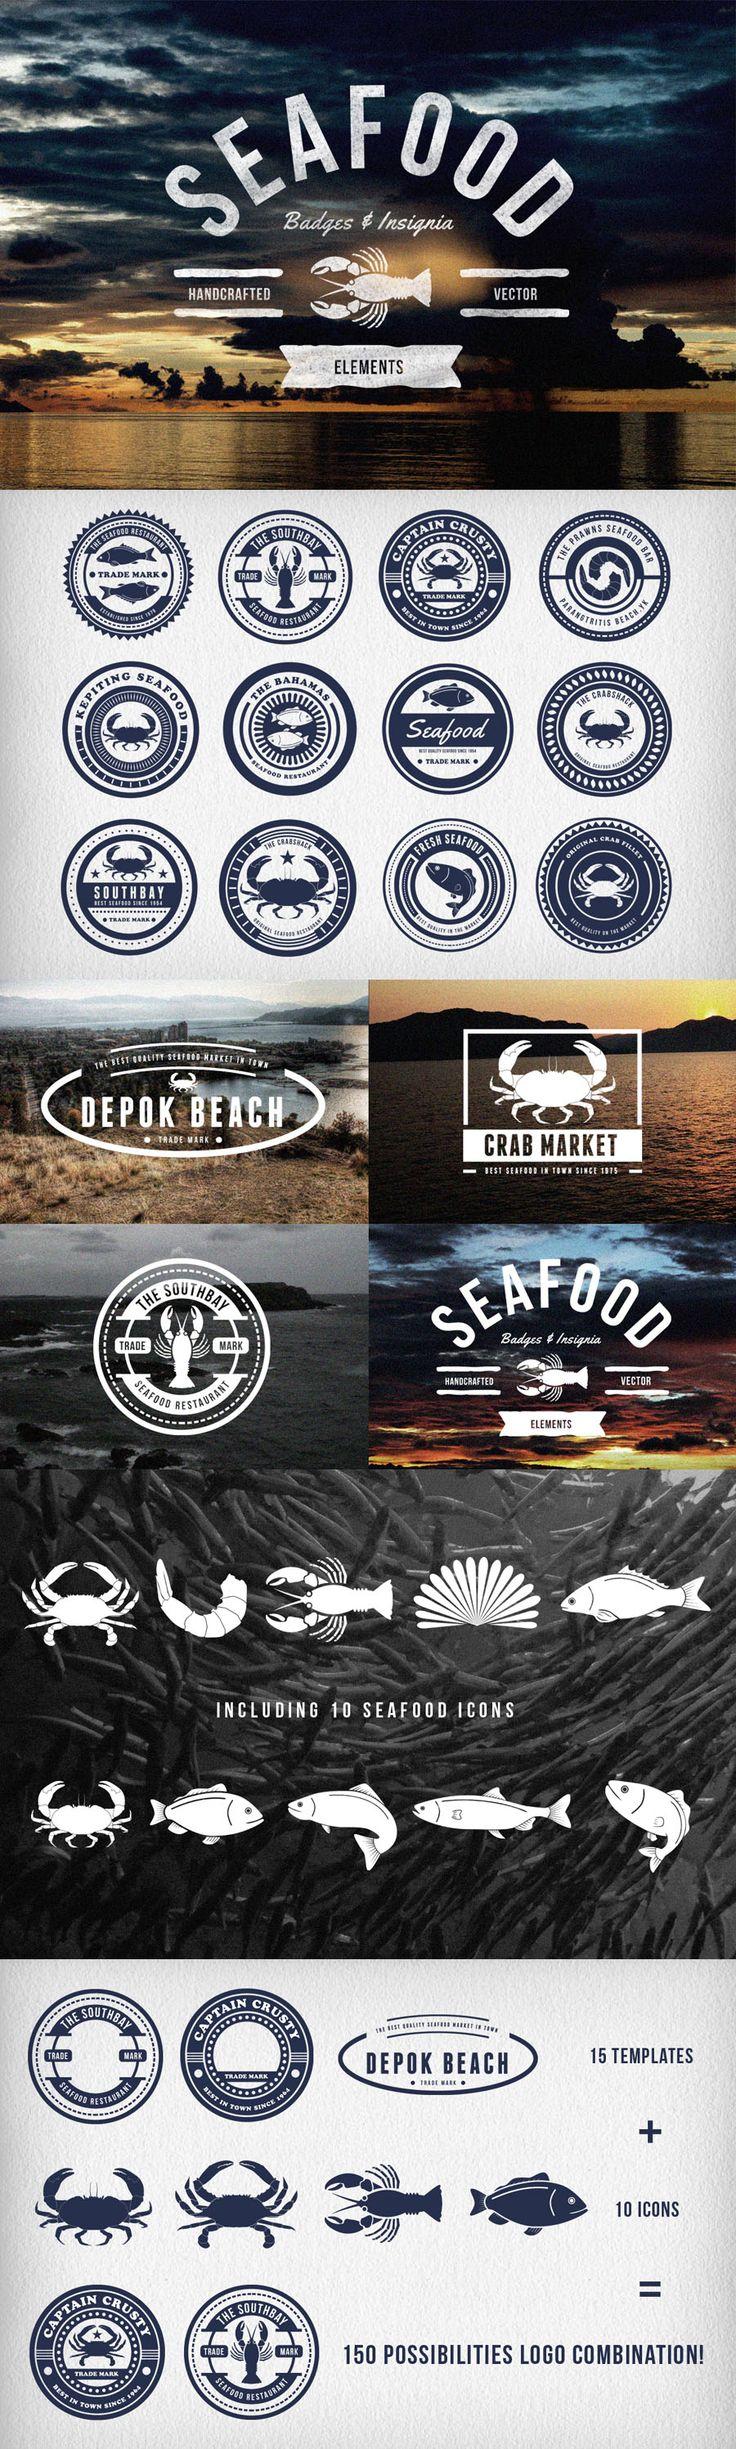 25 best ideas about fish logo on pinterest negative for Fish market design ideas